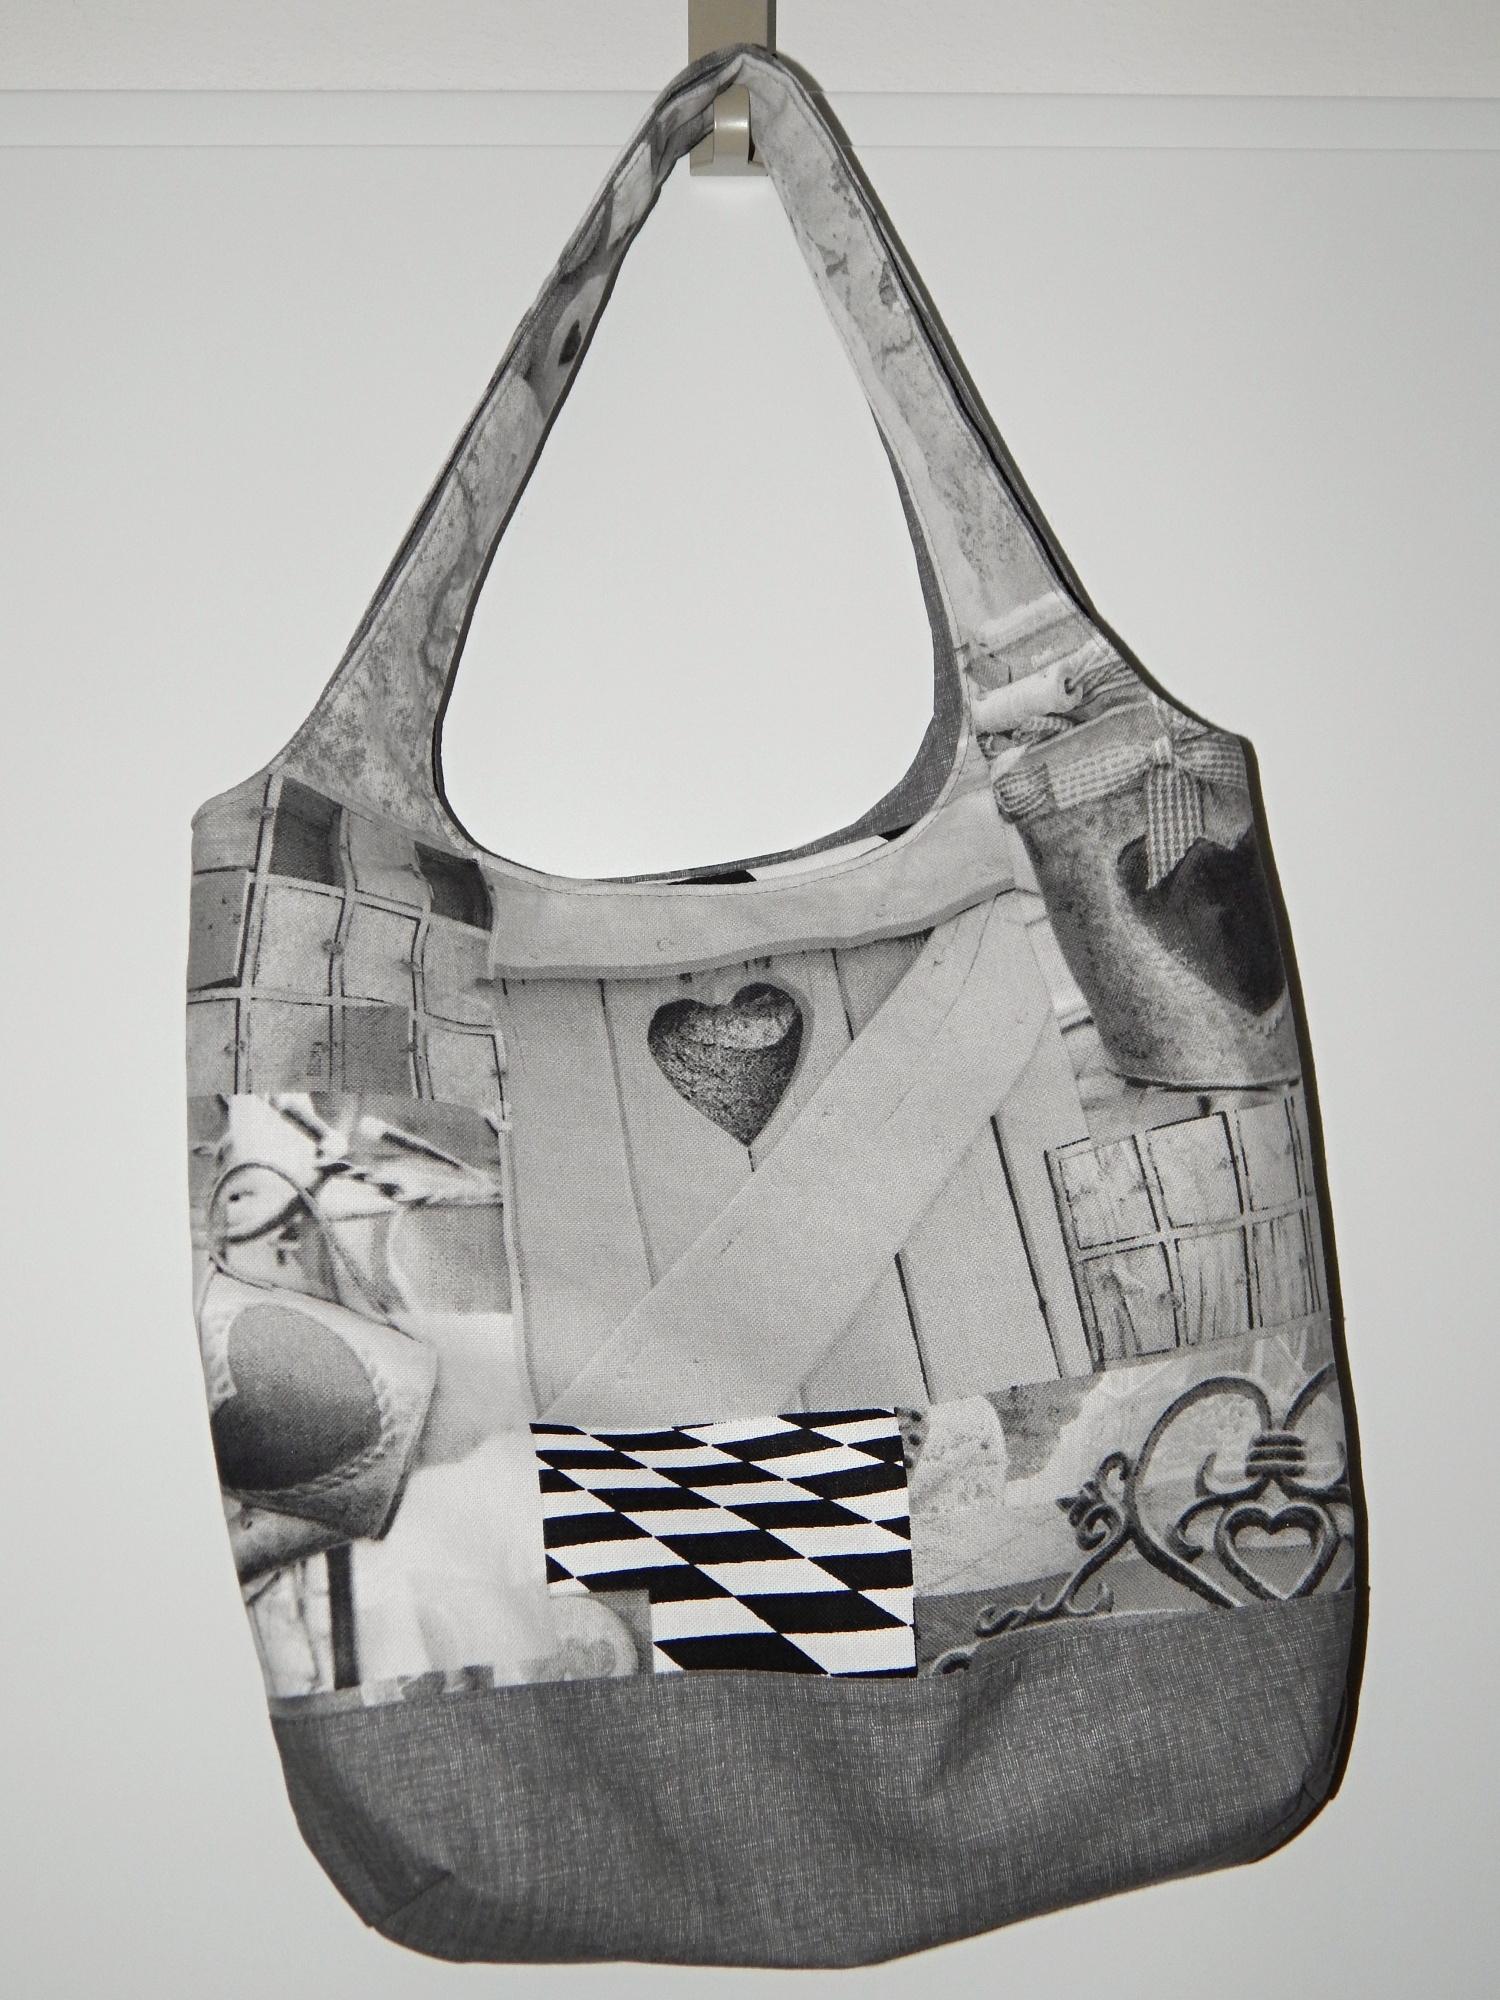 Bíločerná kabelka I.